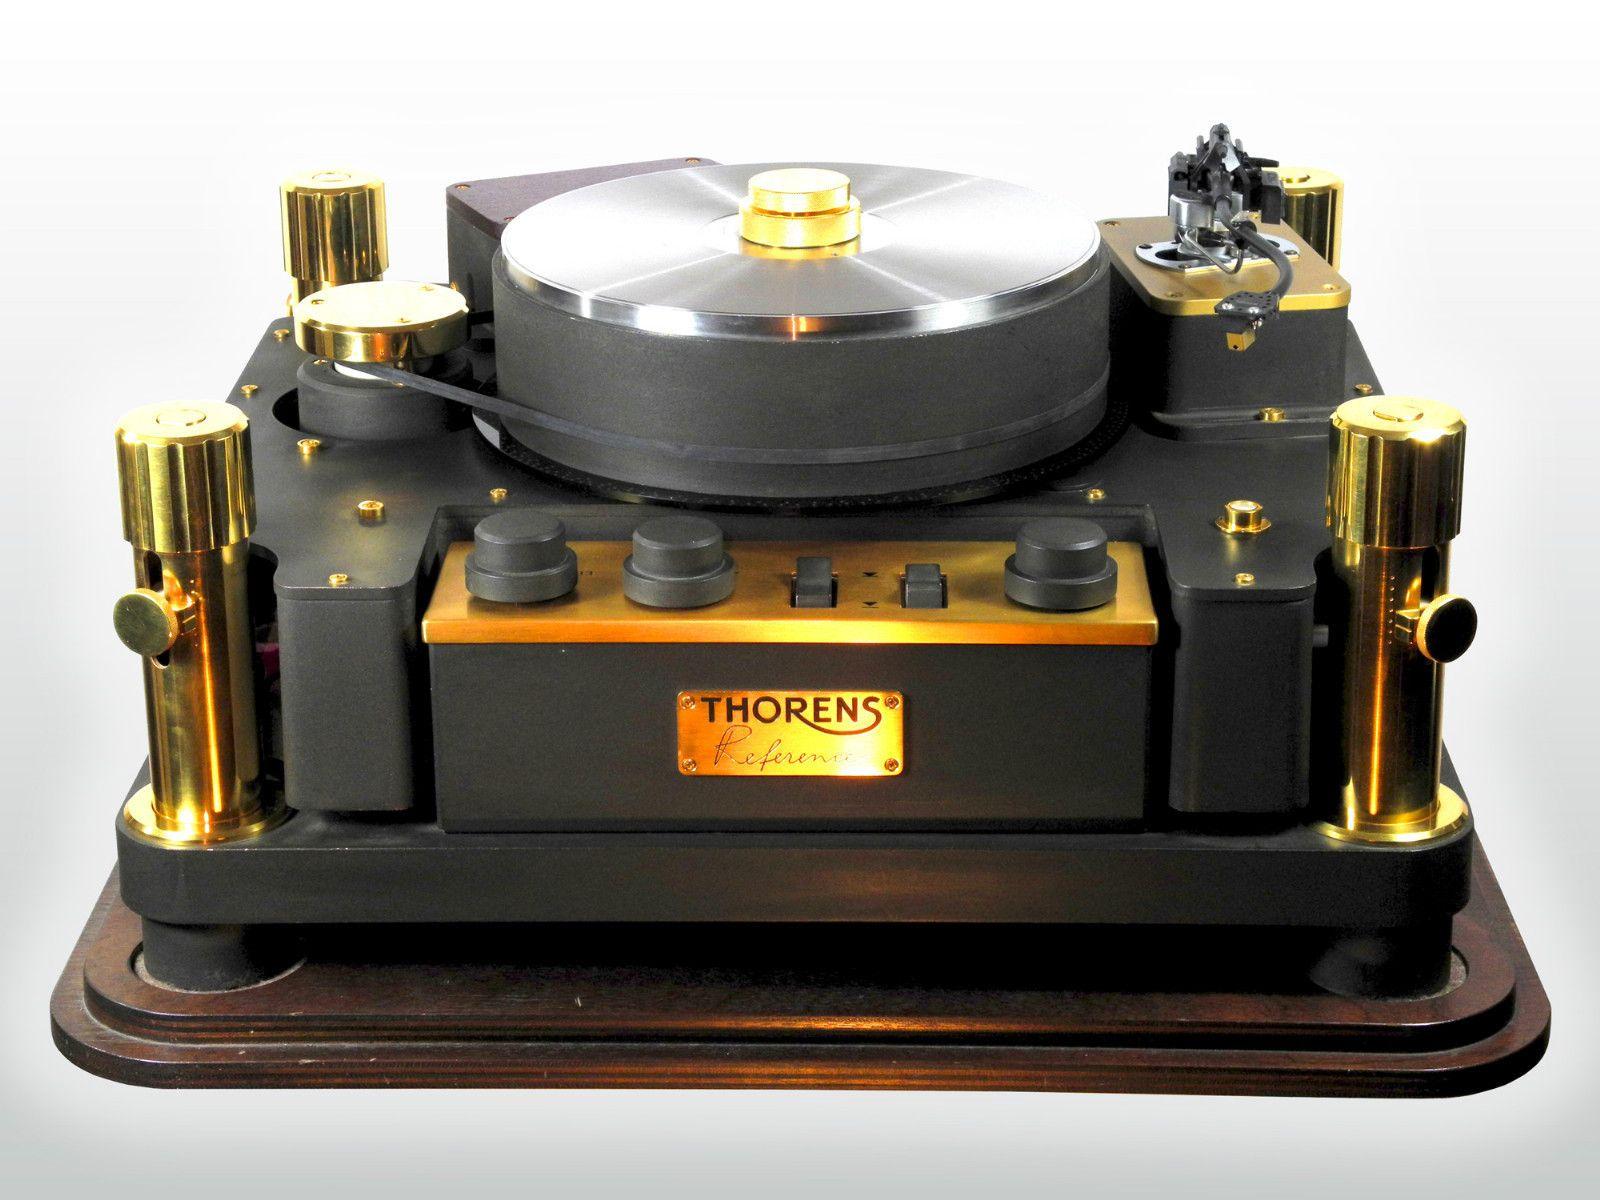 Thorens Reference | Plattenspieler, Schallplattenspieler, Hifi